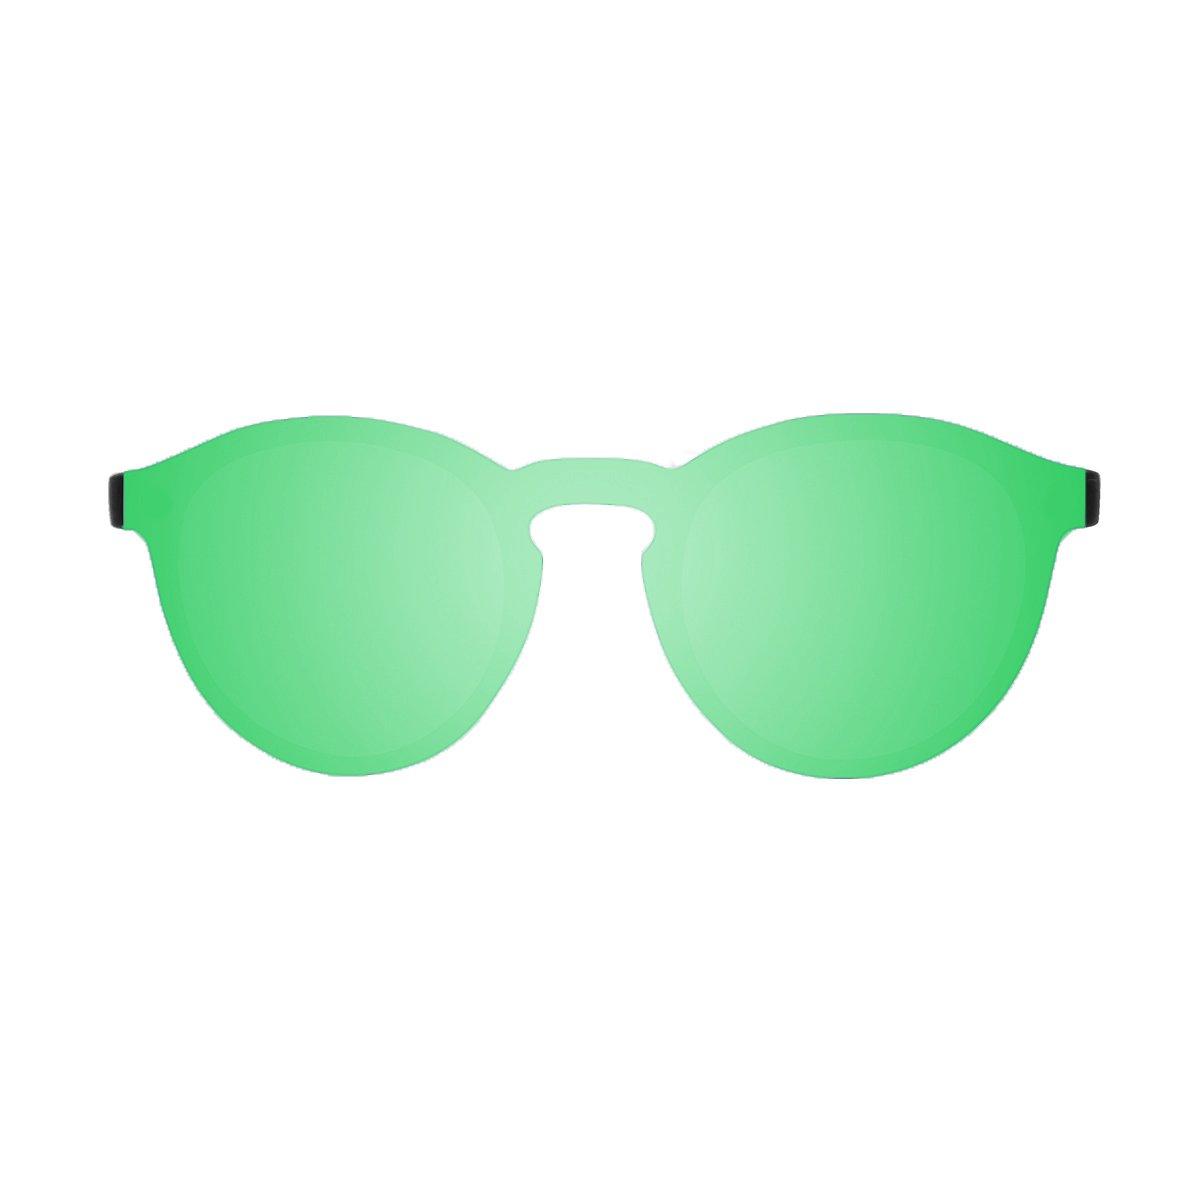 729f1775cc Paloalto Sunglasses p75004.0 Gafas de Sol Unisex Verde OCELL|#Ocean  Sunglasses Gafas